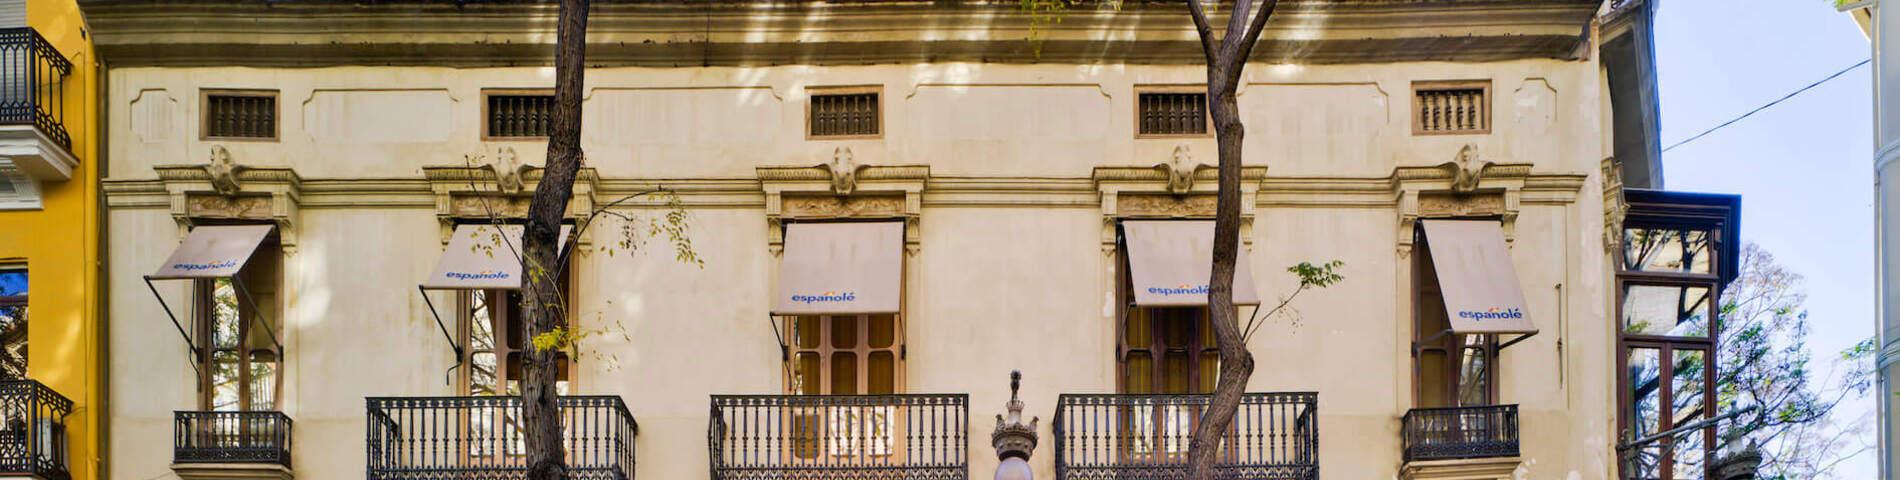 Españole International House صورة 1